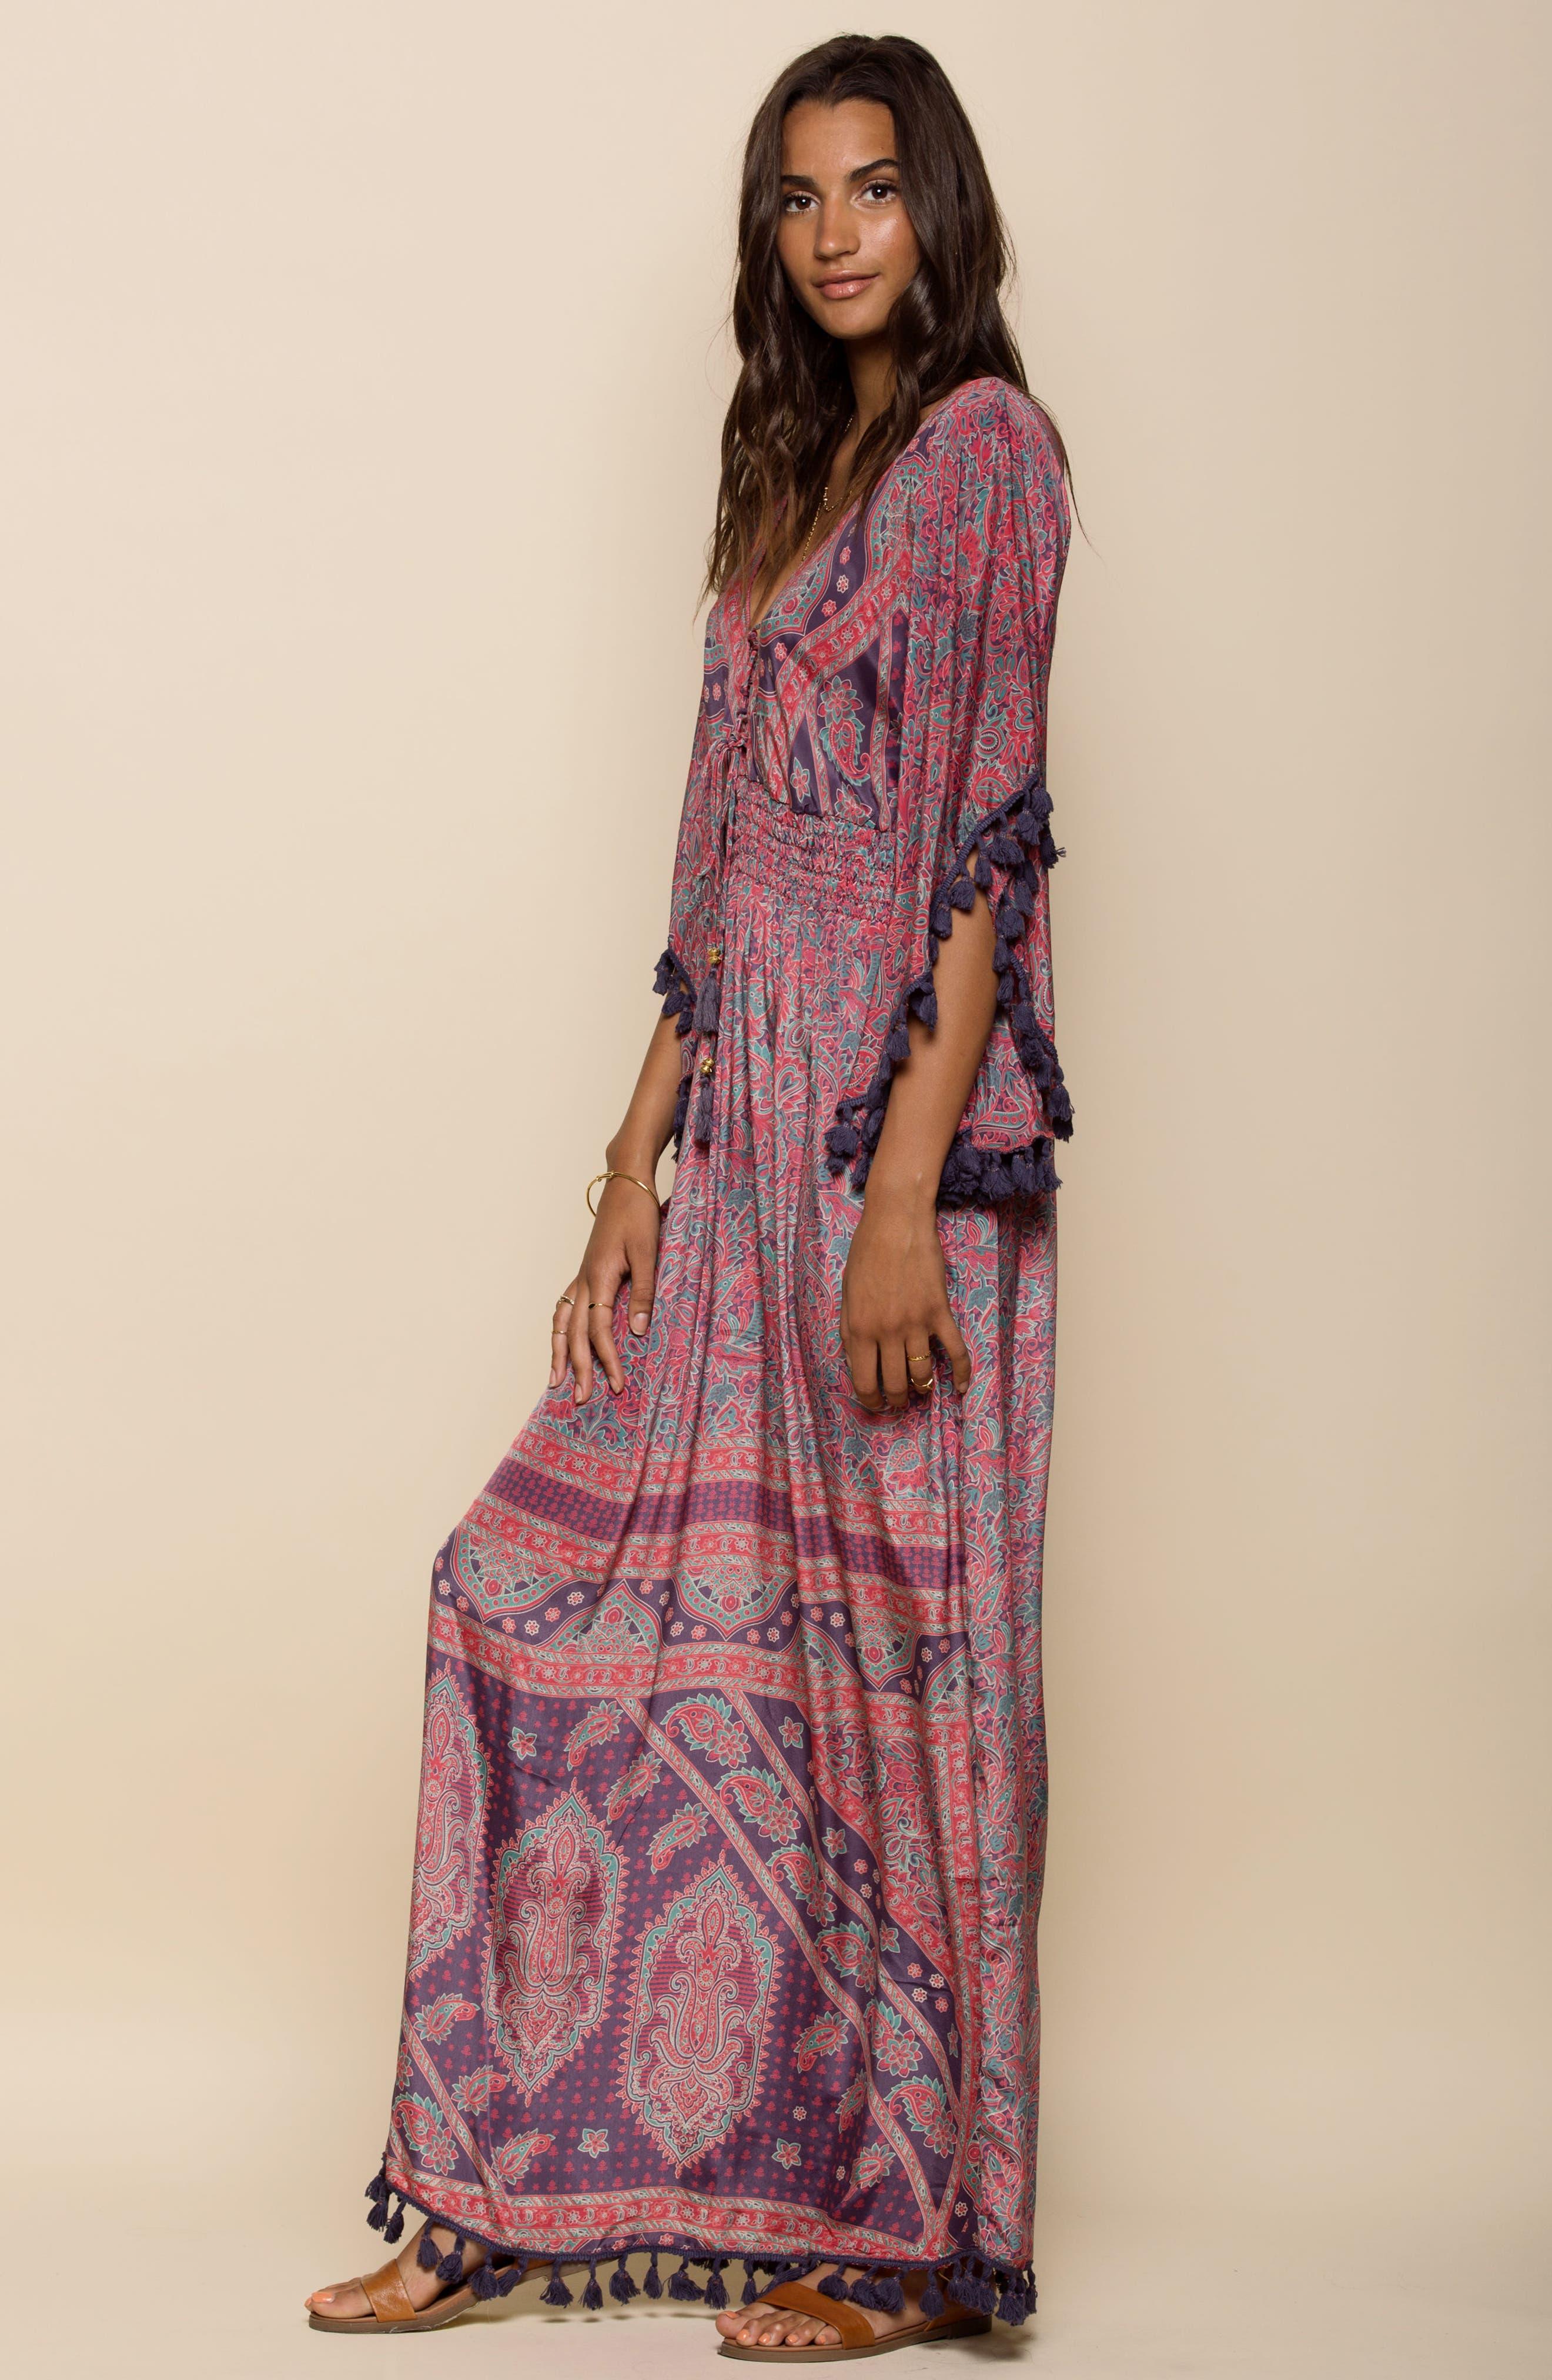 Electric Love Maxi Dress,                             Alternate thumbnail 8, color,                             MULTI